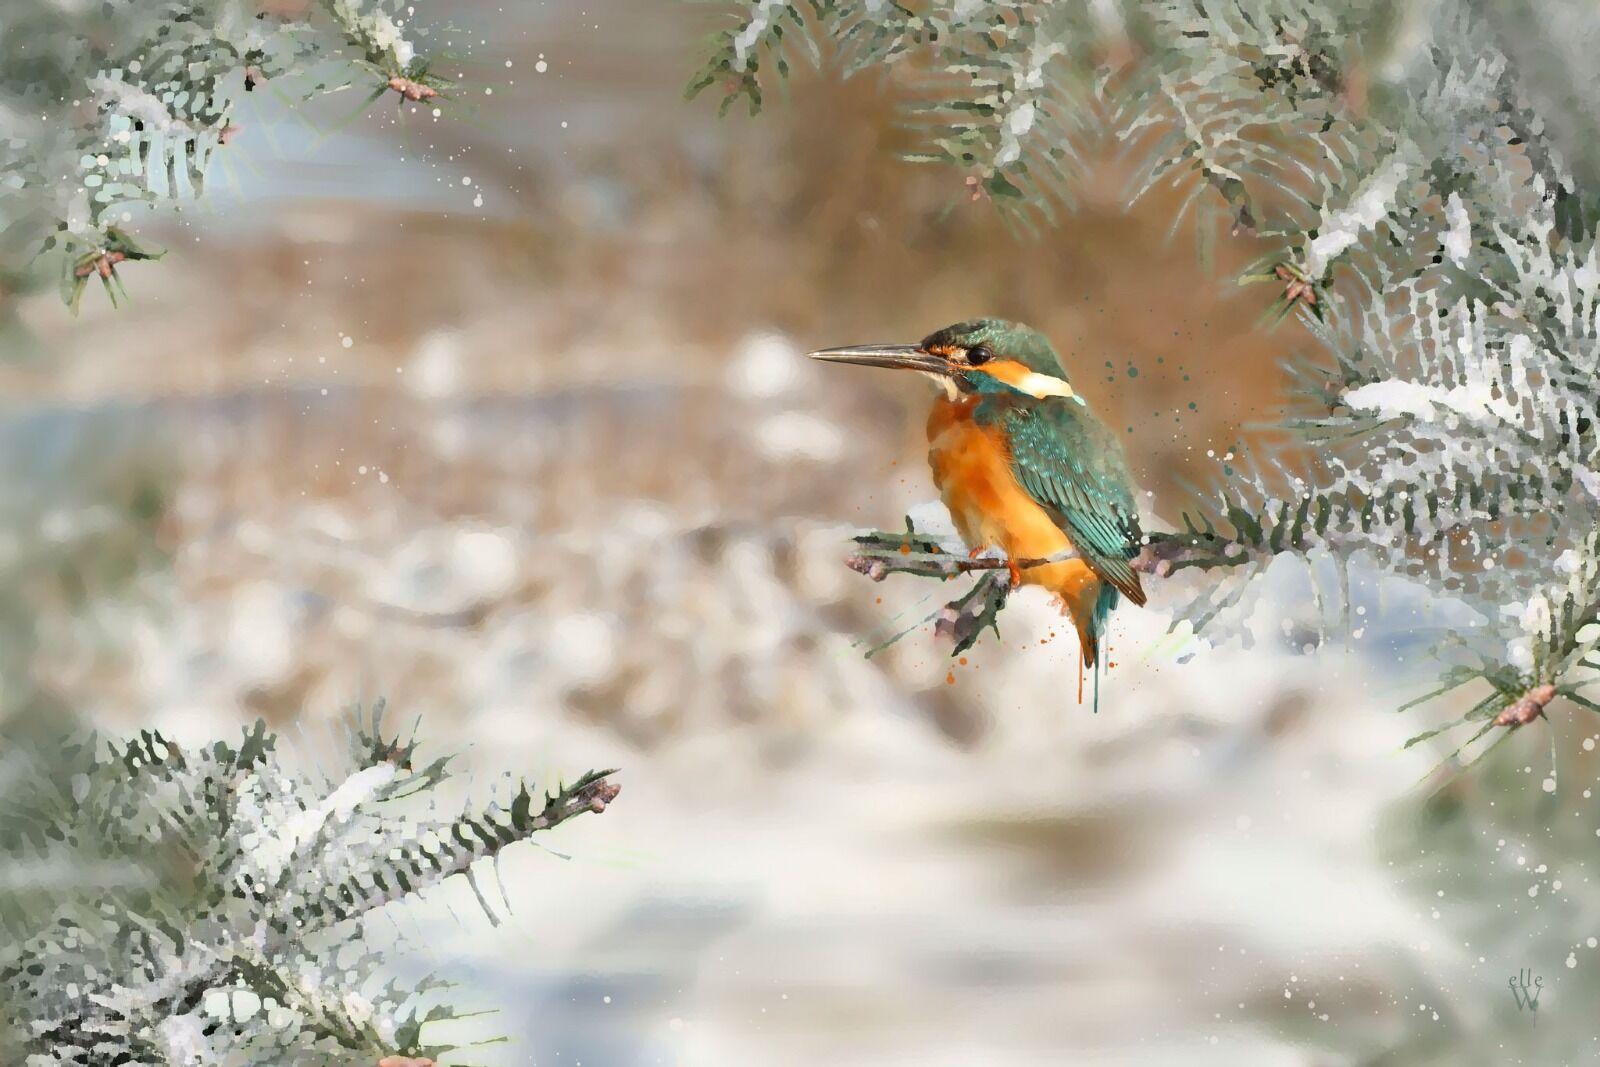 Kingfisher - Mixed Art Effect